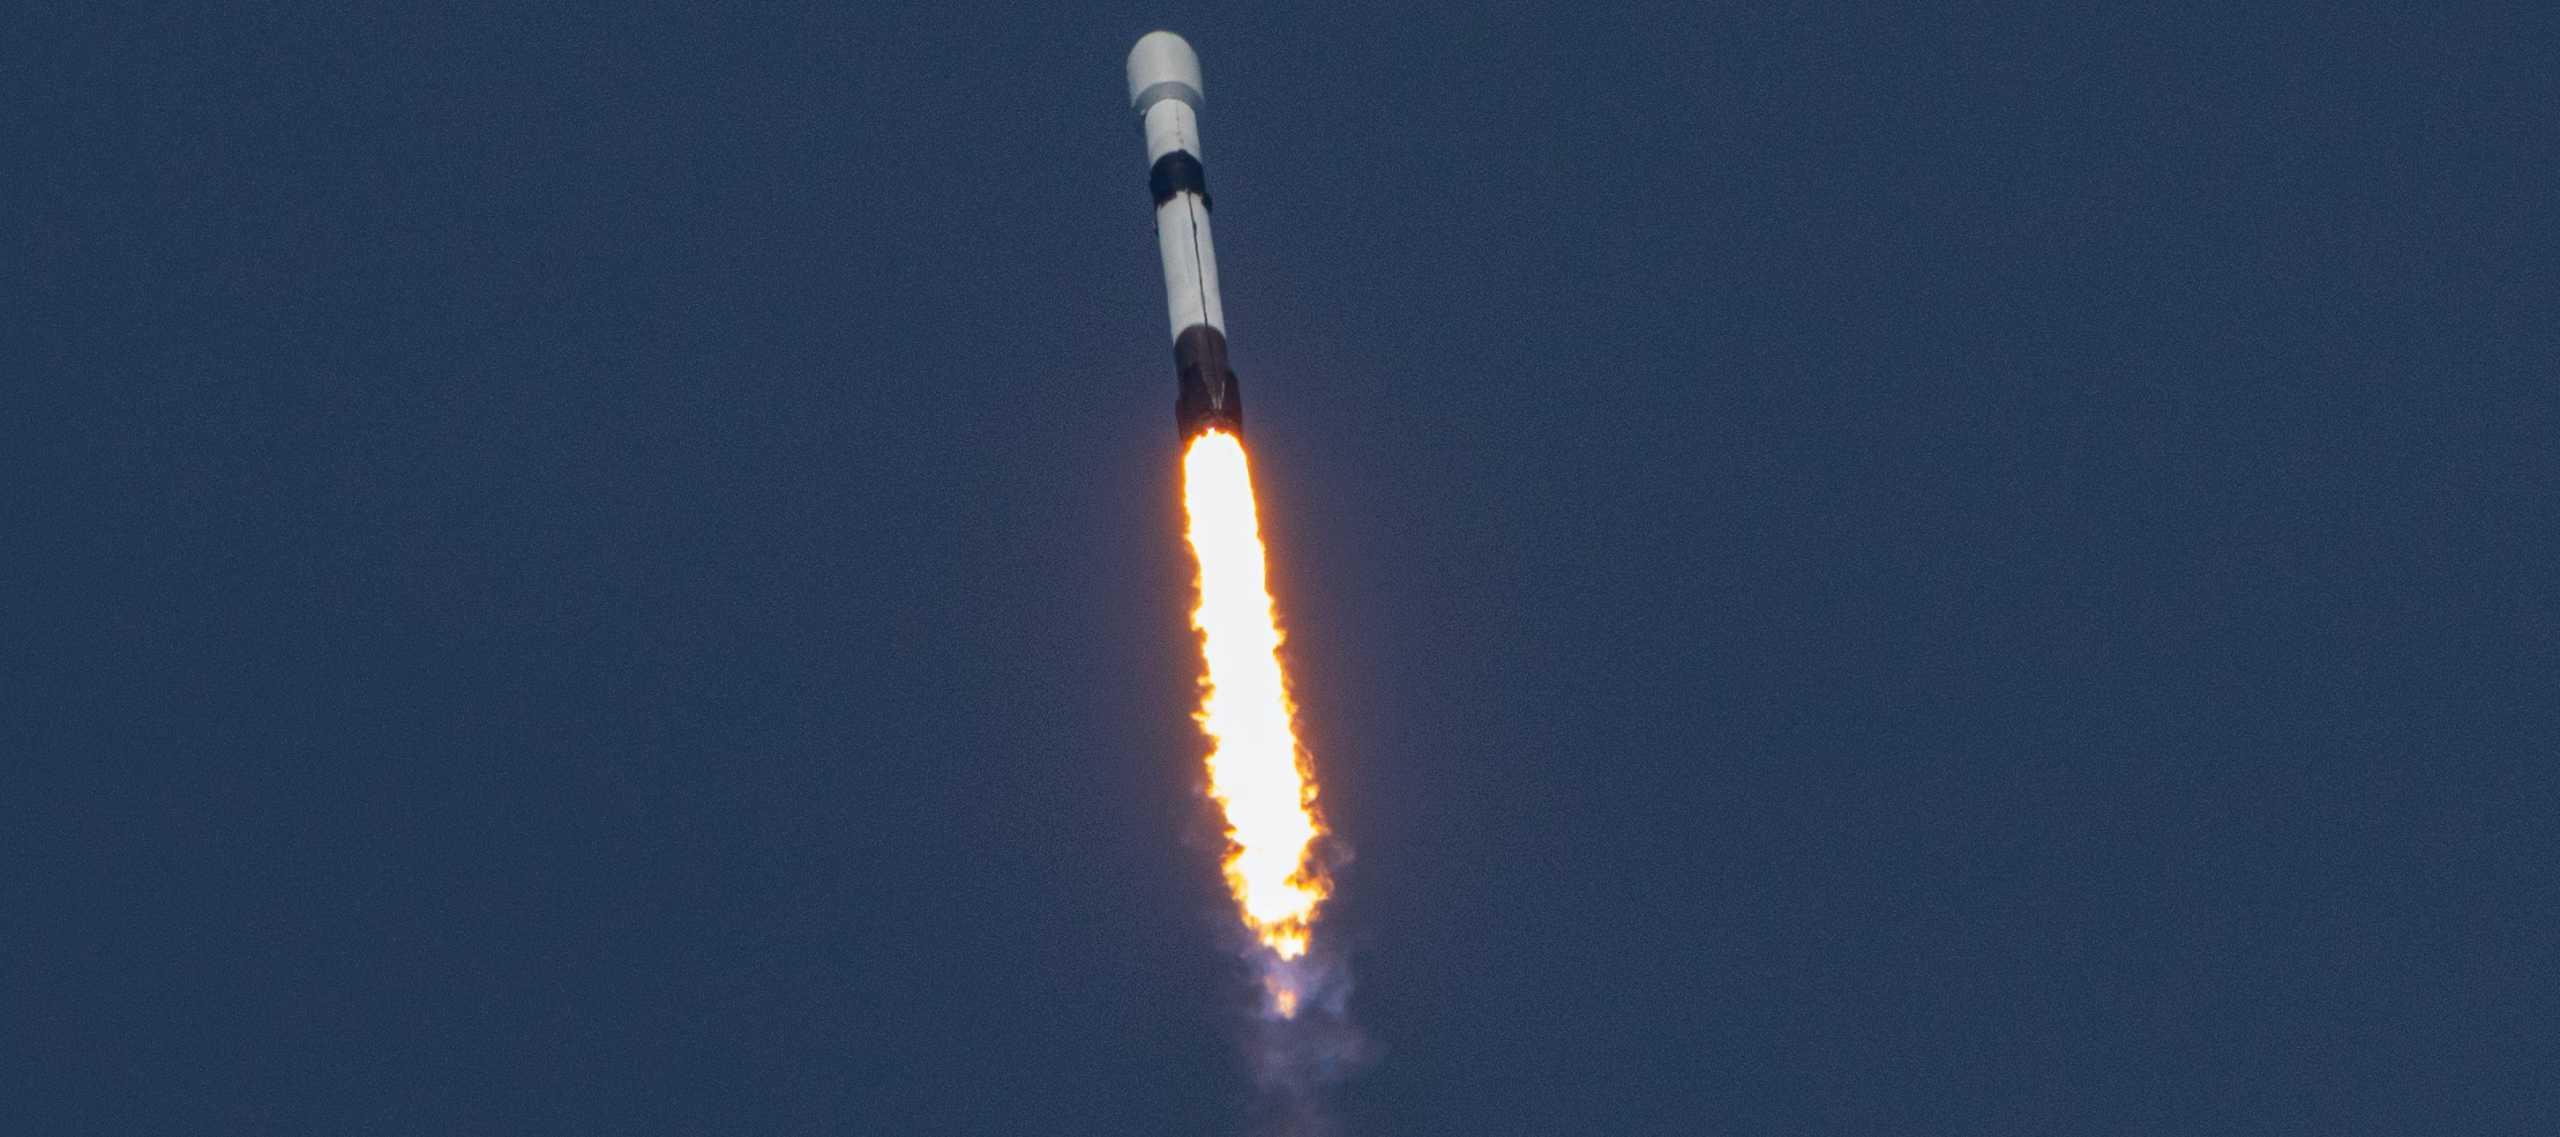 Falcon 9 Starlink 6 042220 (Richard Angle) launch 3 (c)